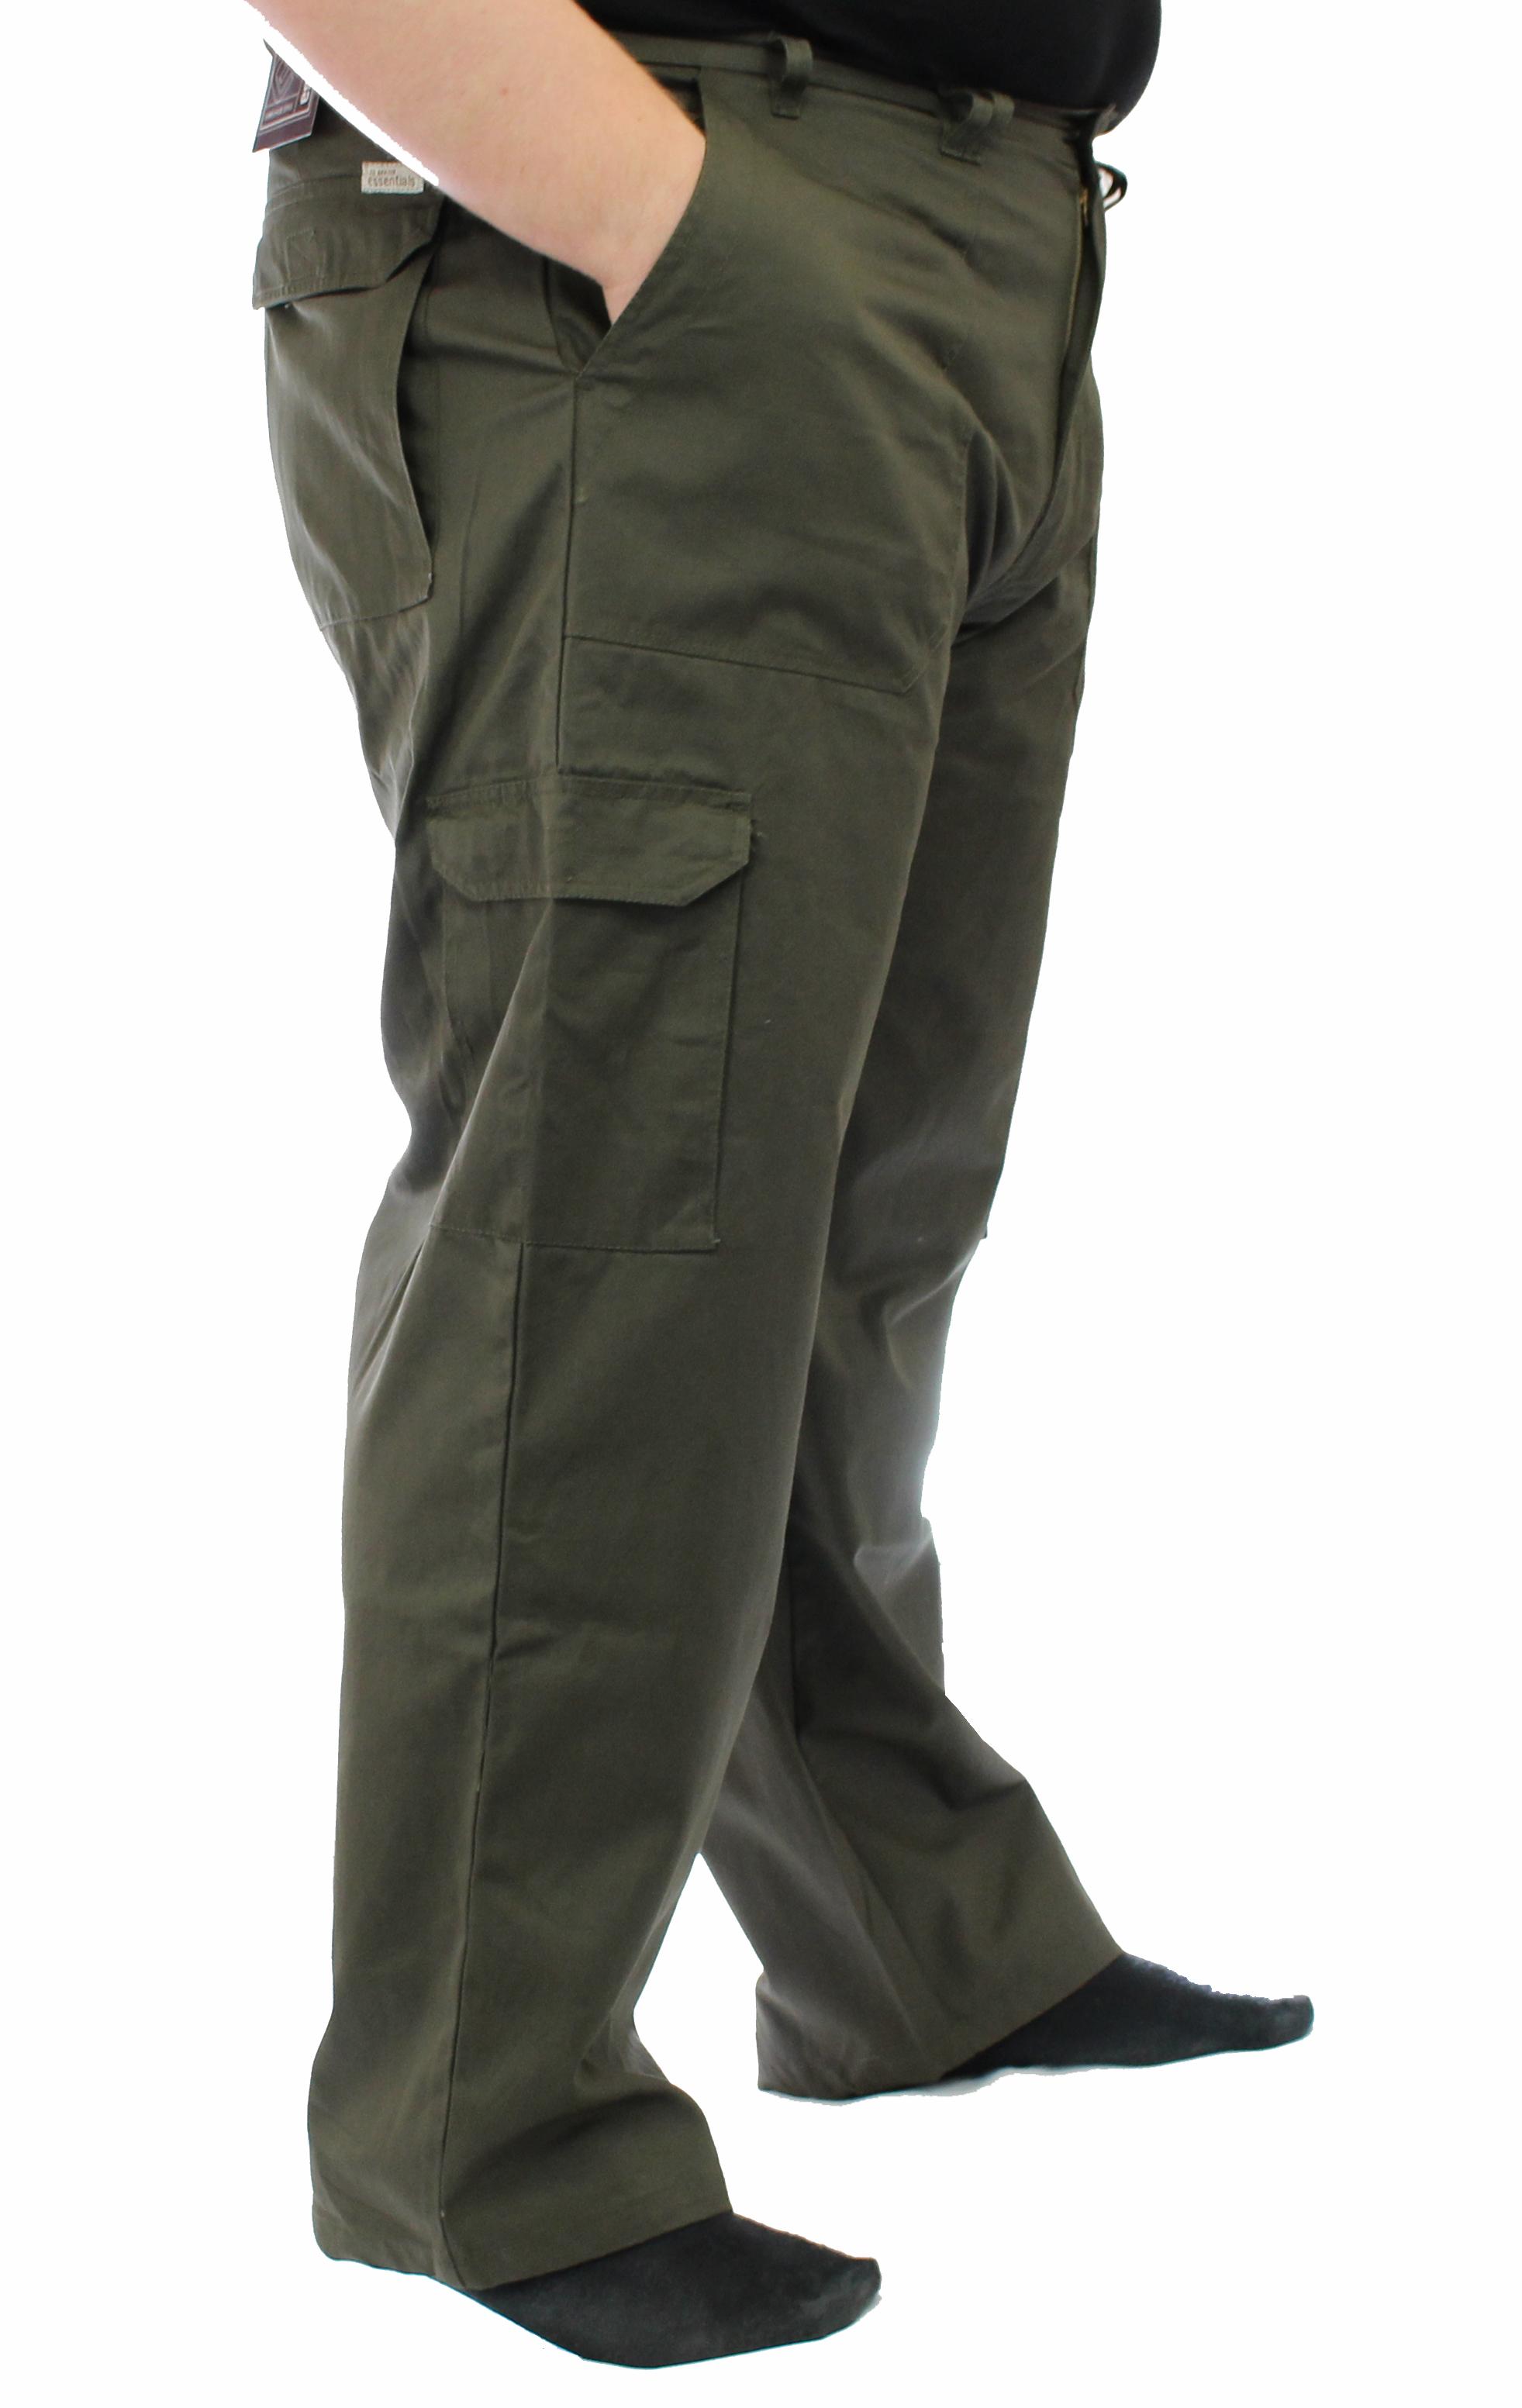 "Ed Baxter Victory - Heavy Duty Cargo Combat Trousers - Khaki - 62"" Waist, 30"" Leg"